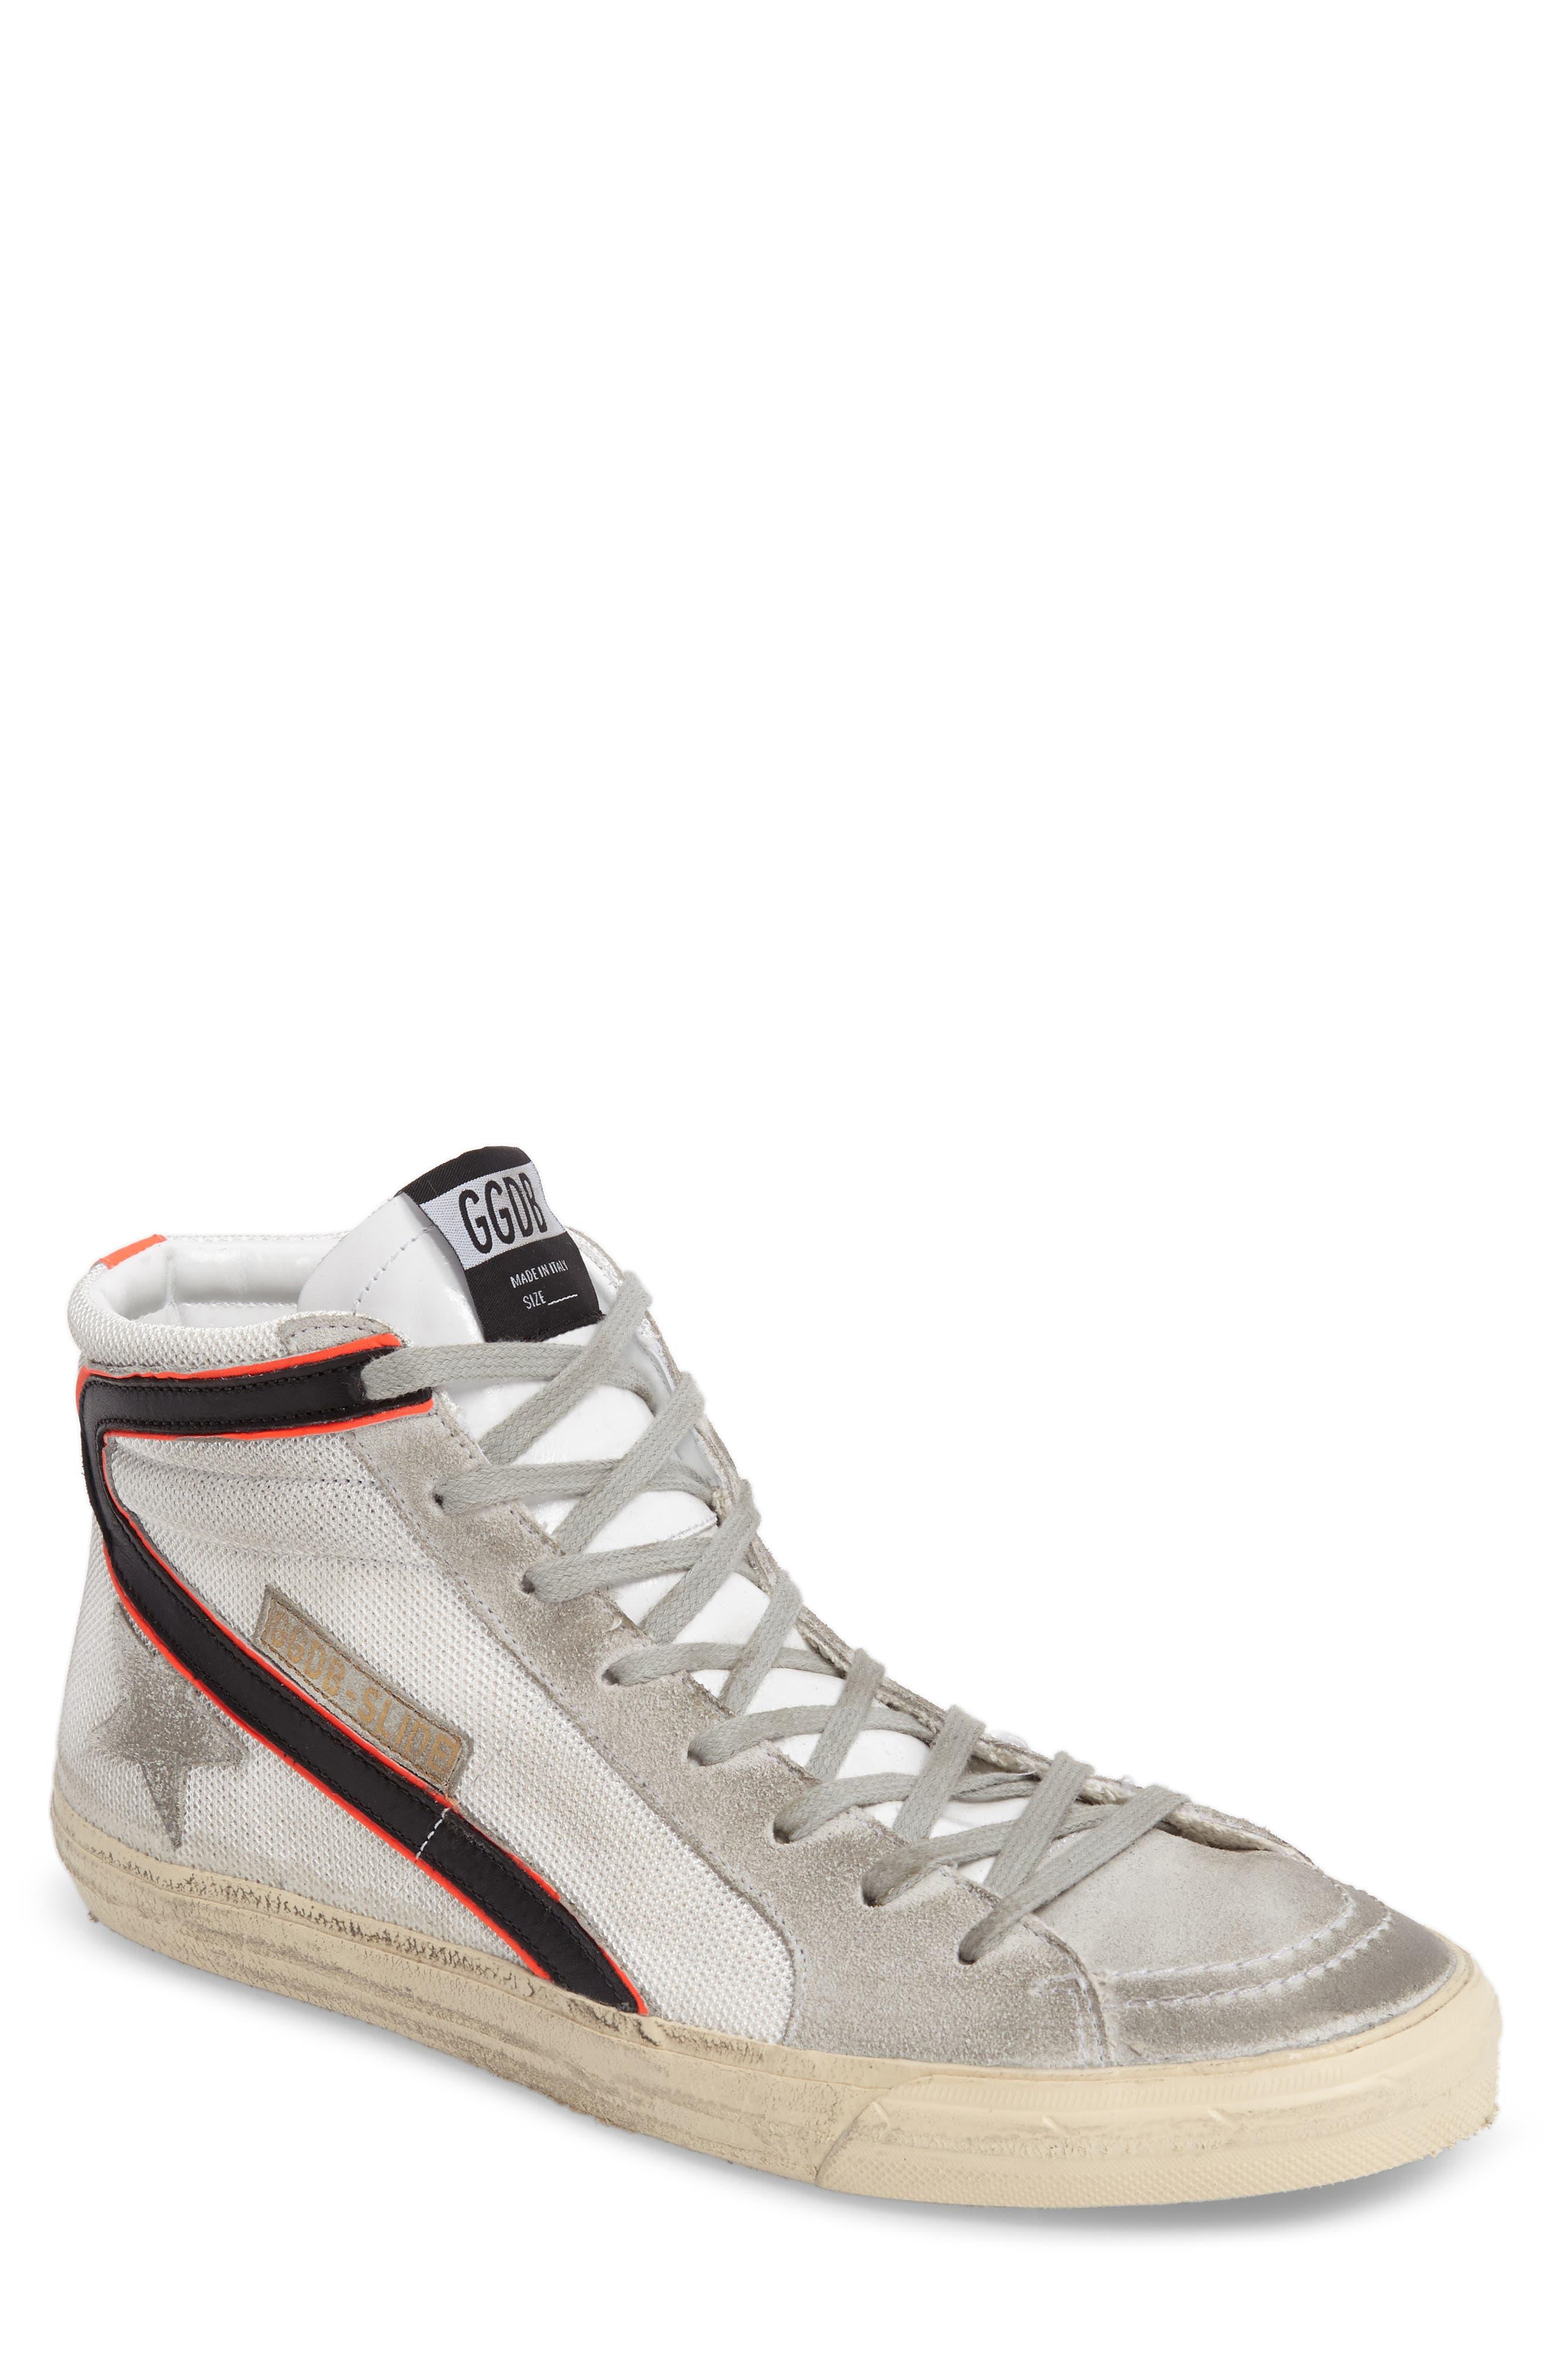 'Slide' Sneaker,                             Main thumbnail 1, color,                             White/ Silver Leather